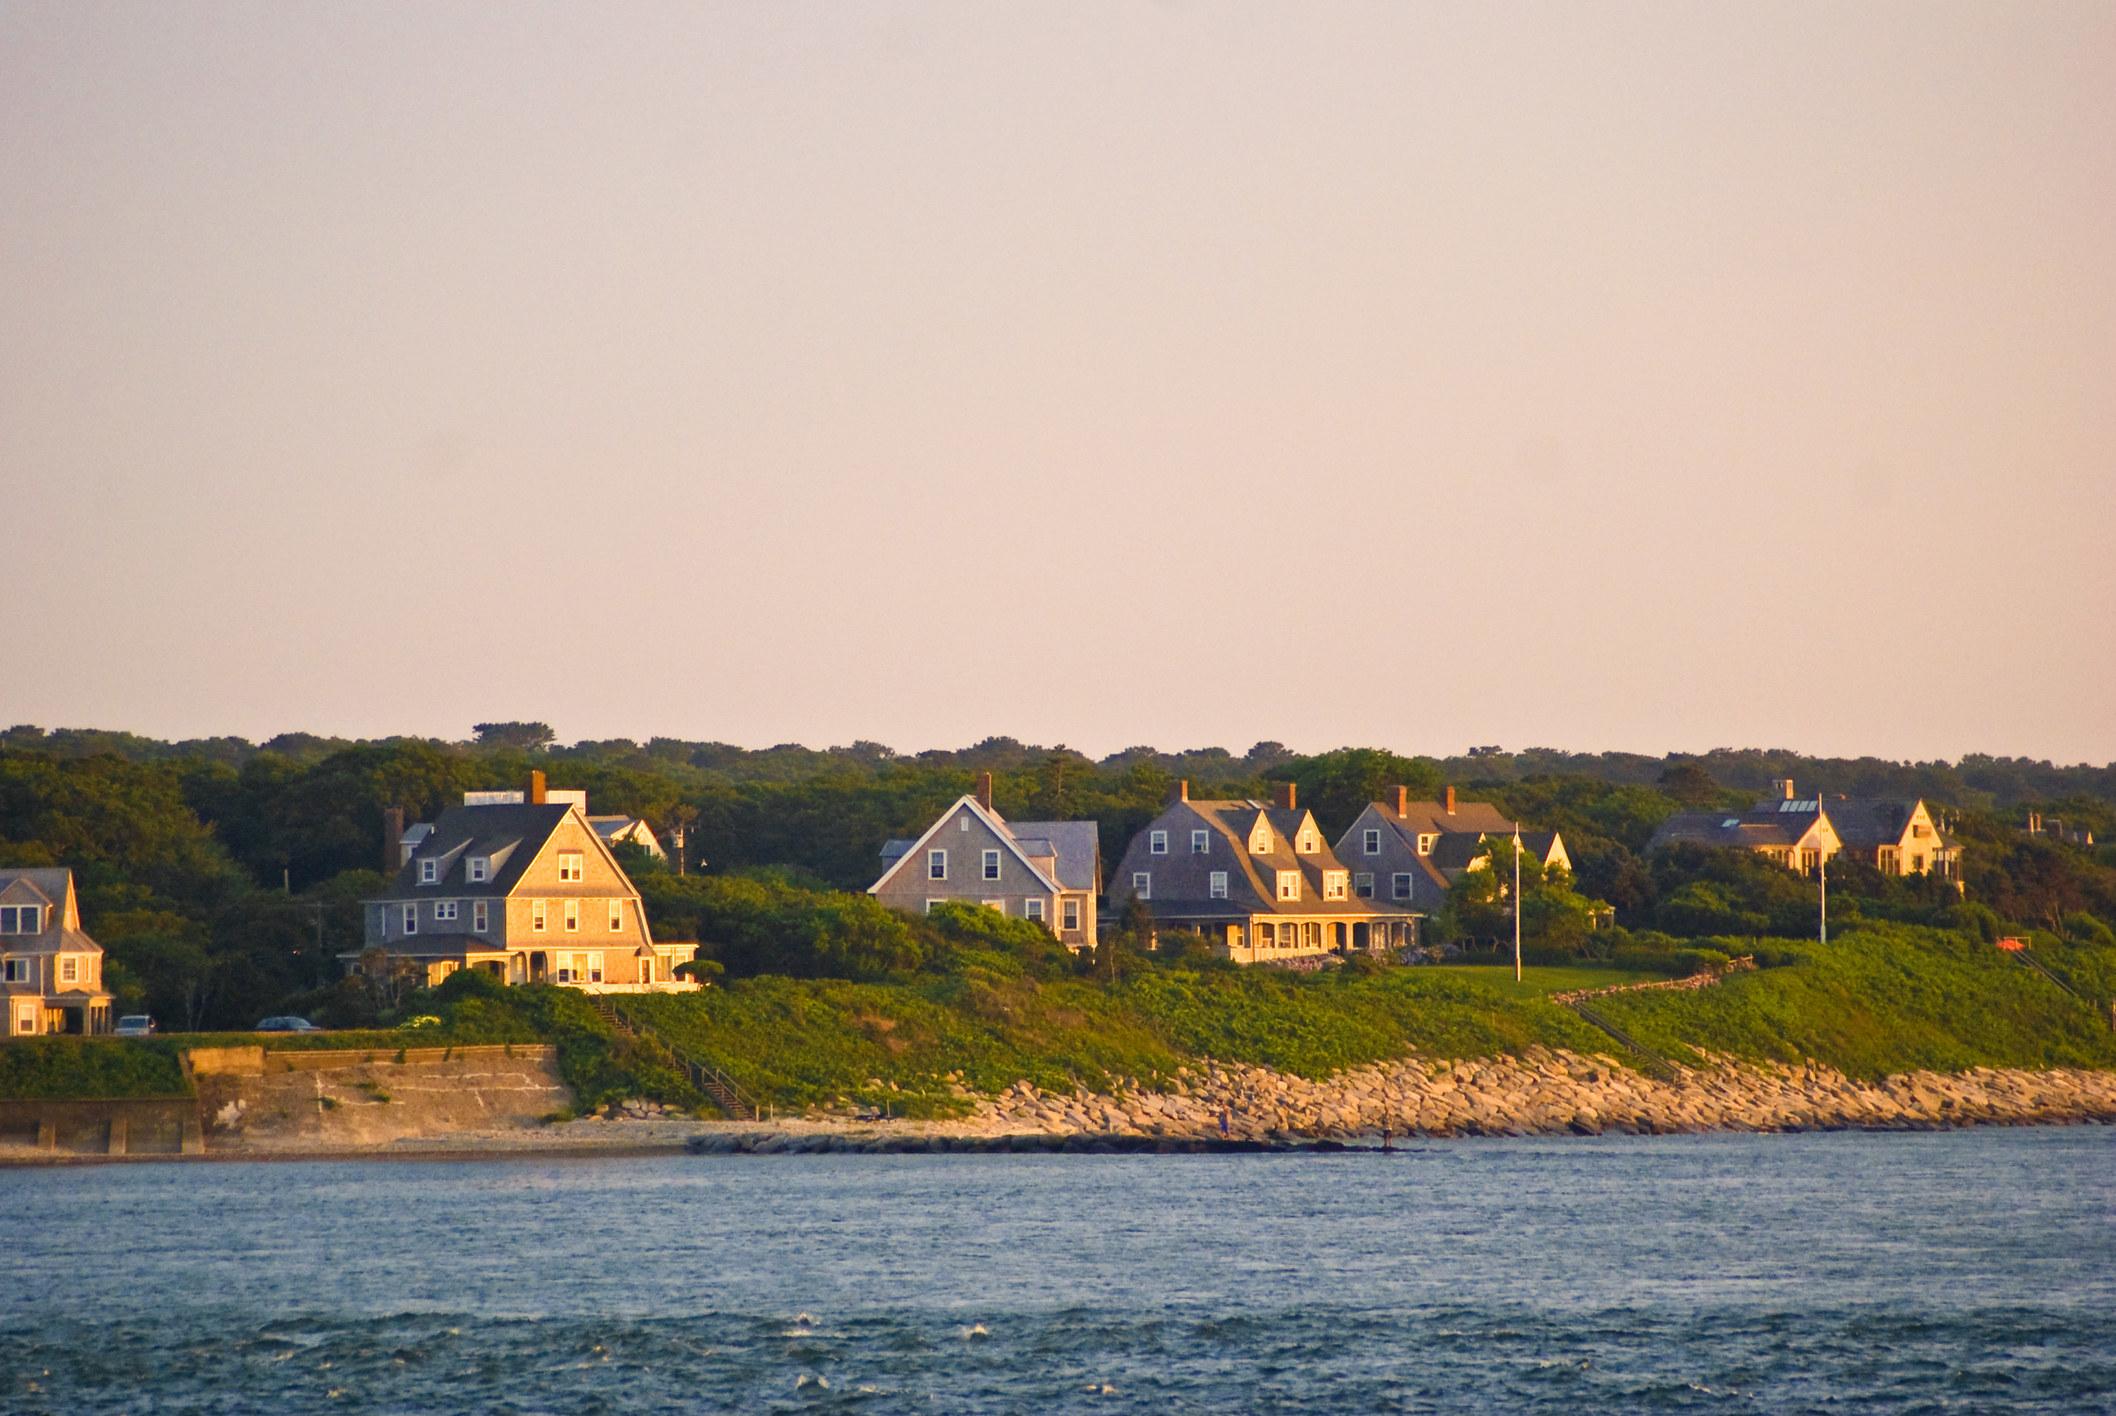 Seaside houses on Cape Cod.